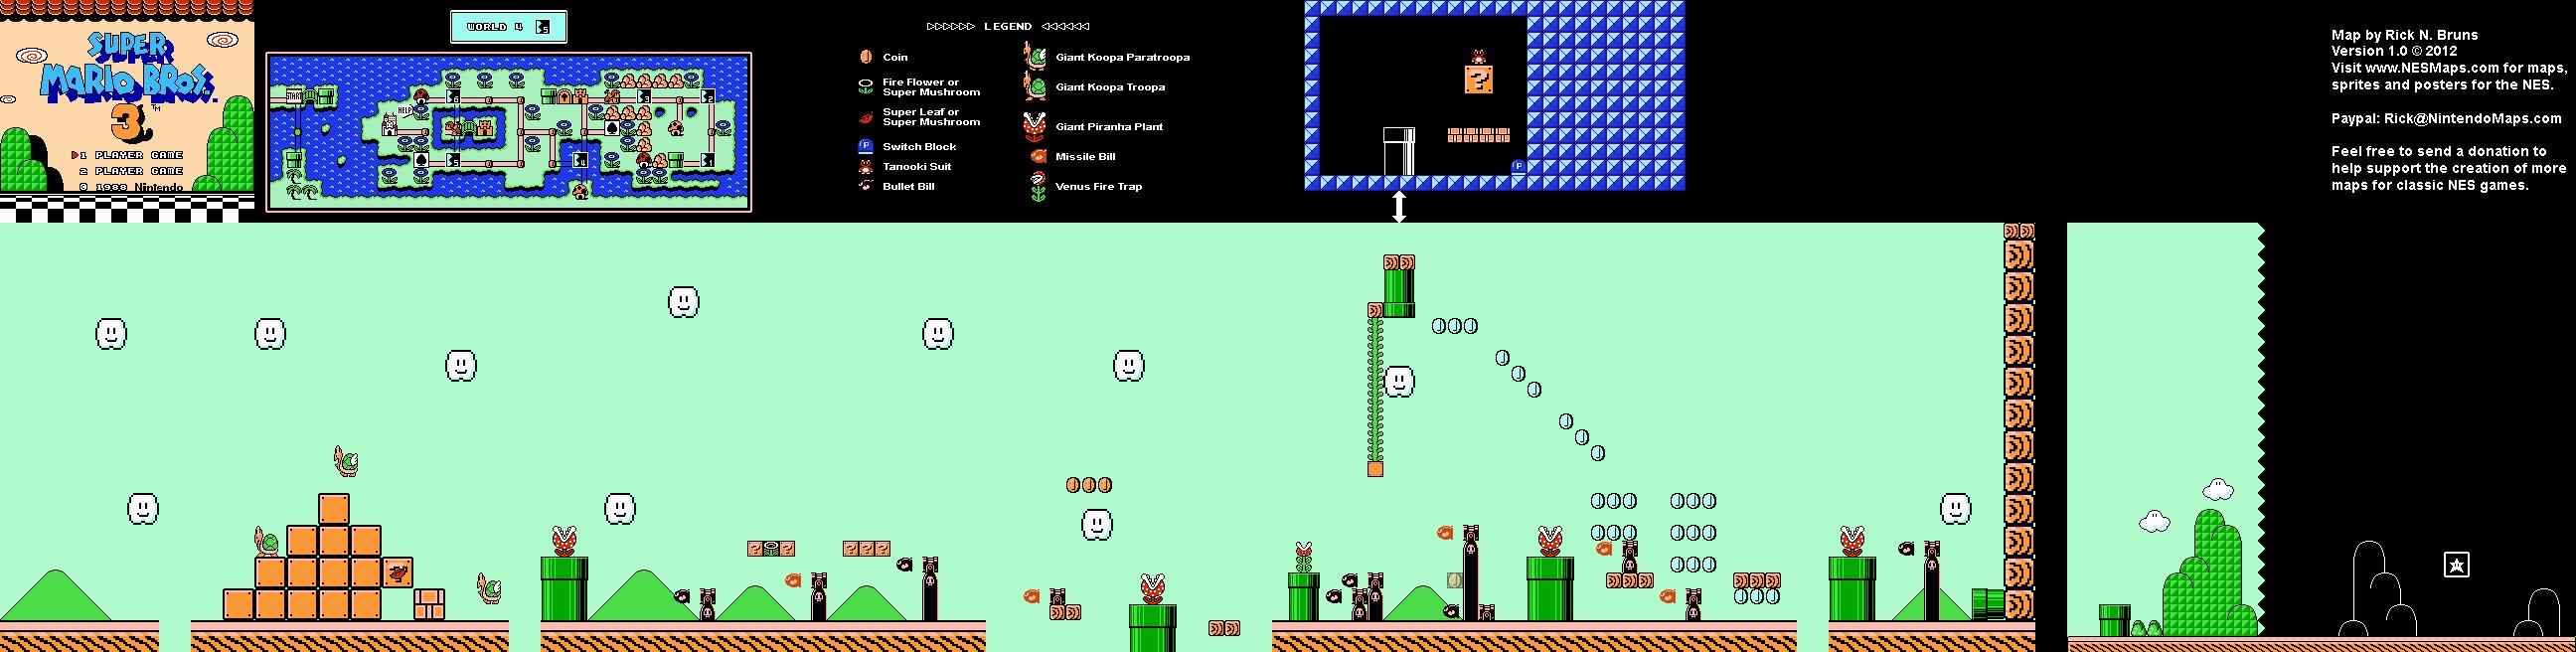 Super Mario Brothers 3 - World 4-5 Nintendo NES Map